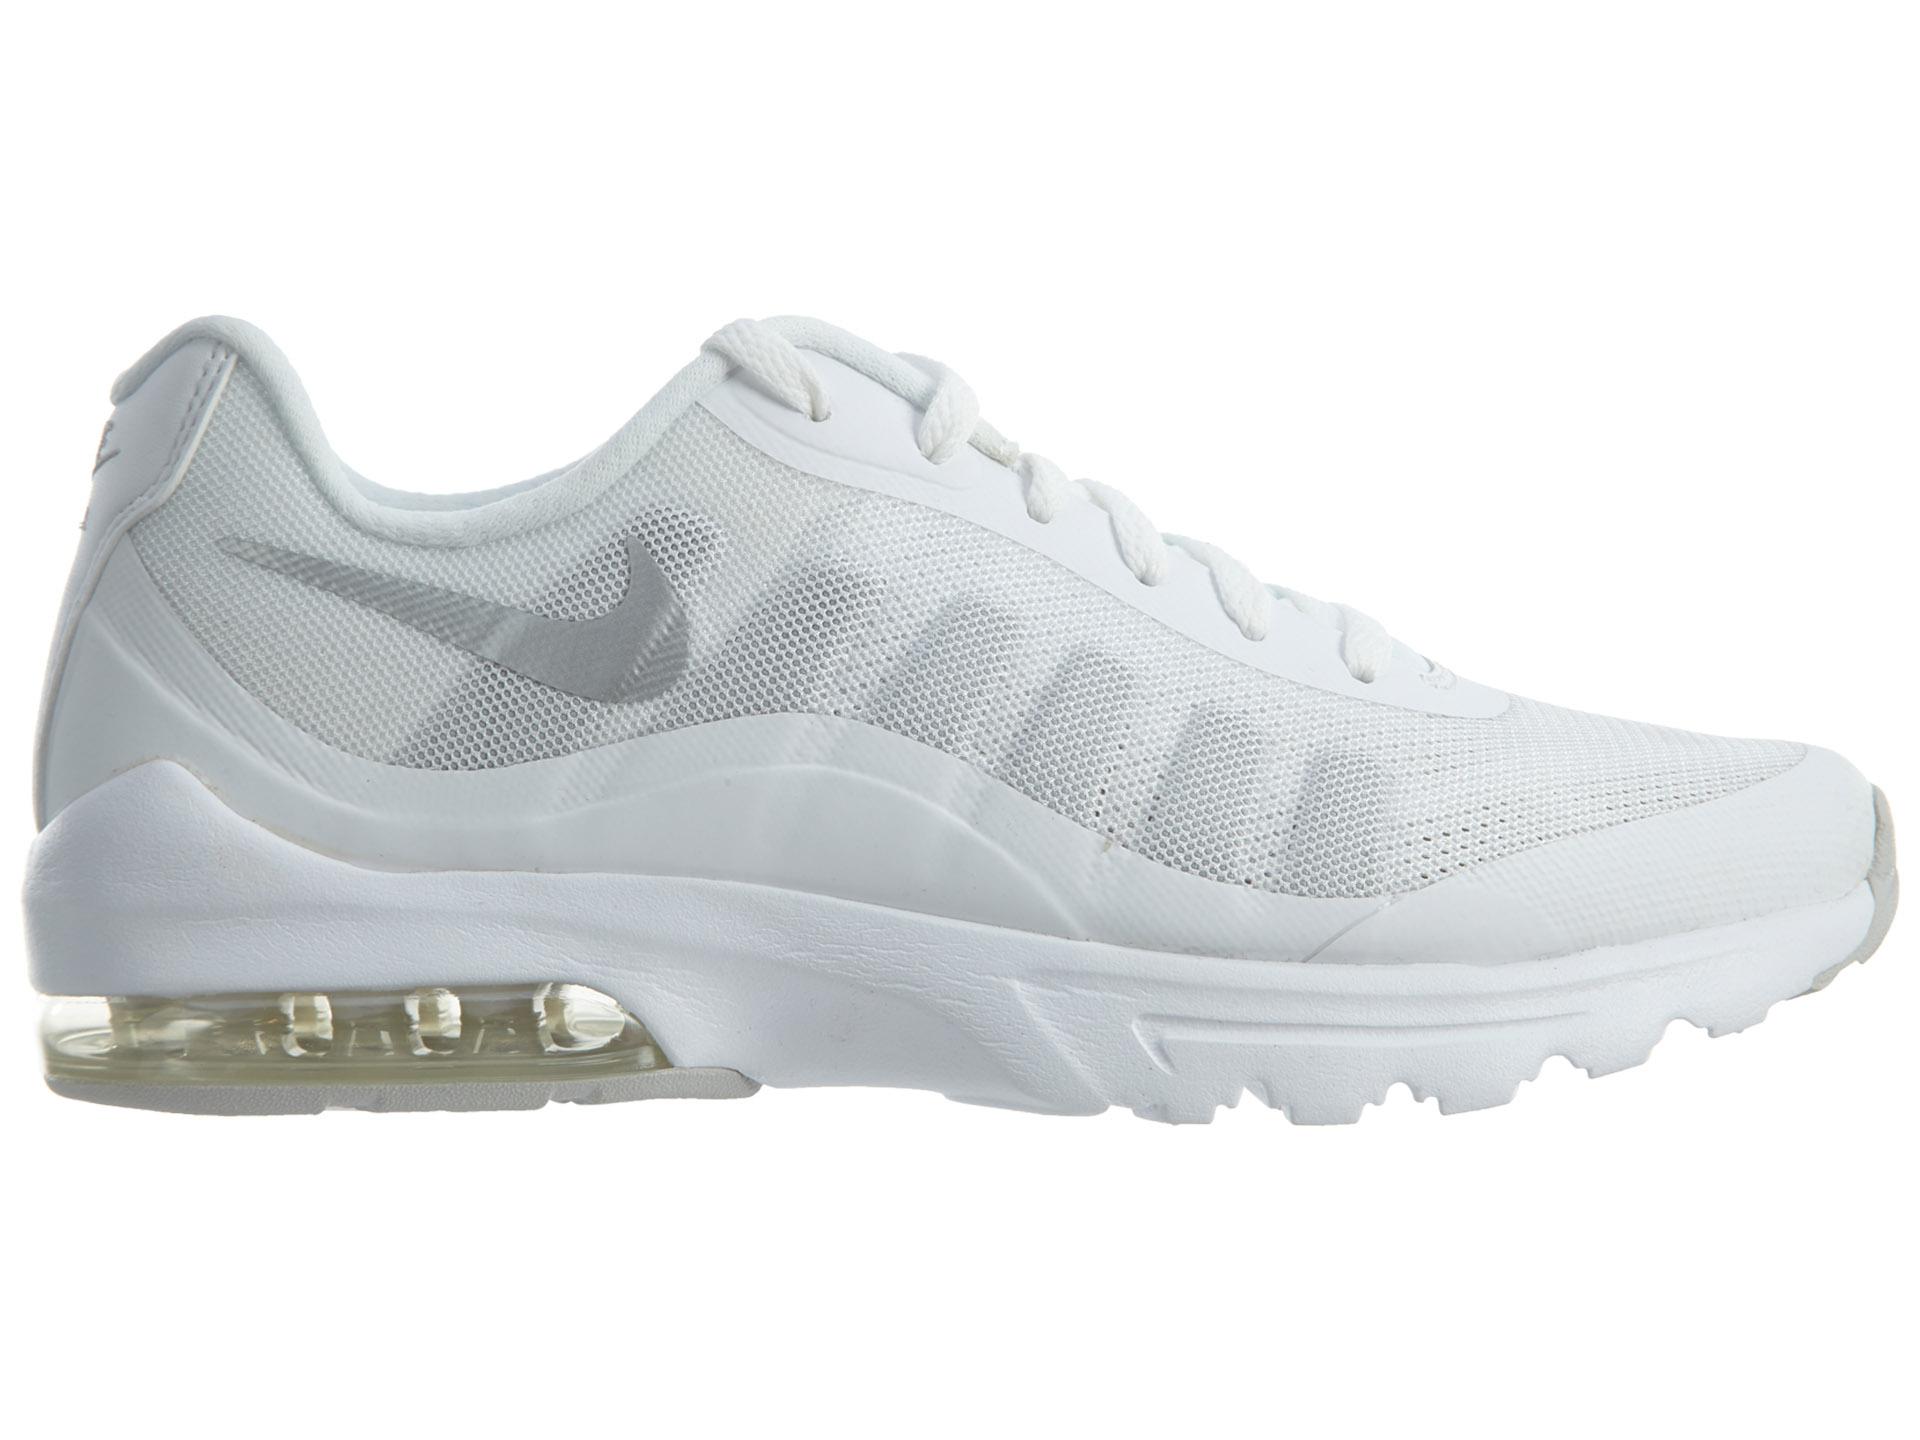 Nike Air Max Invigor White Metallic